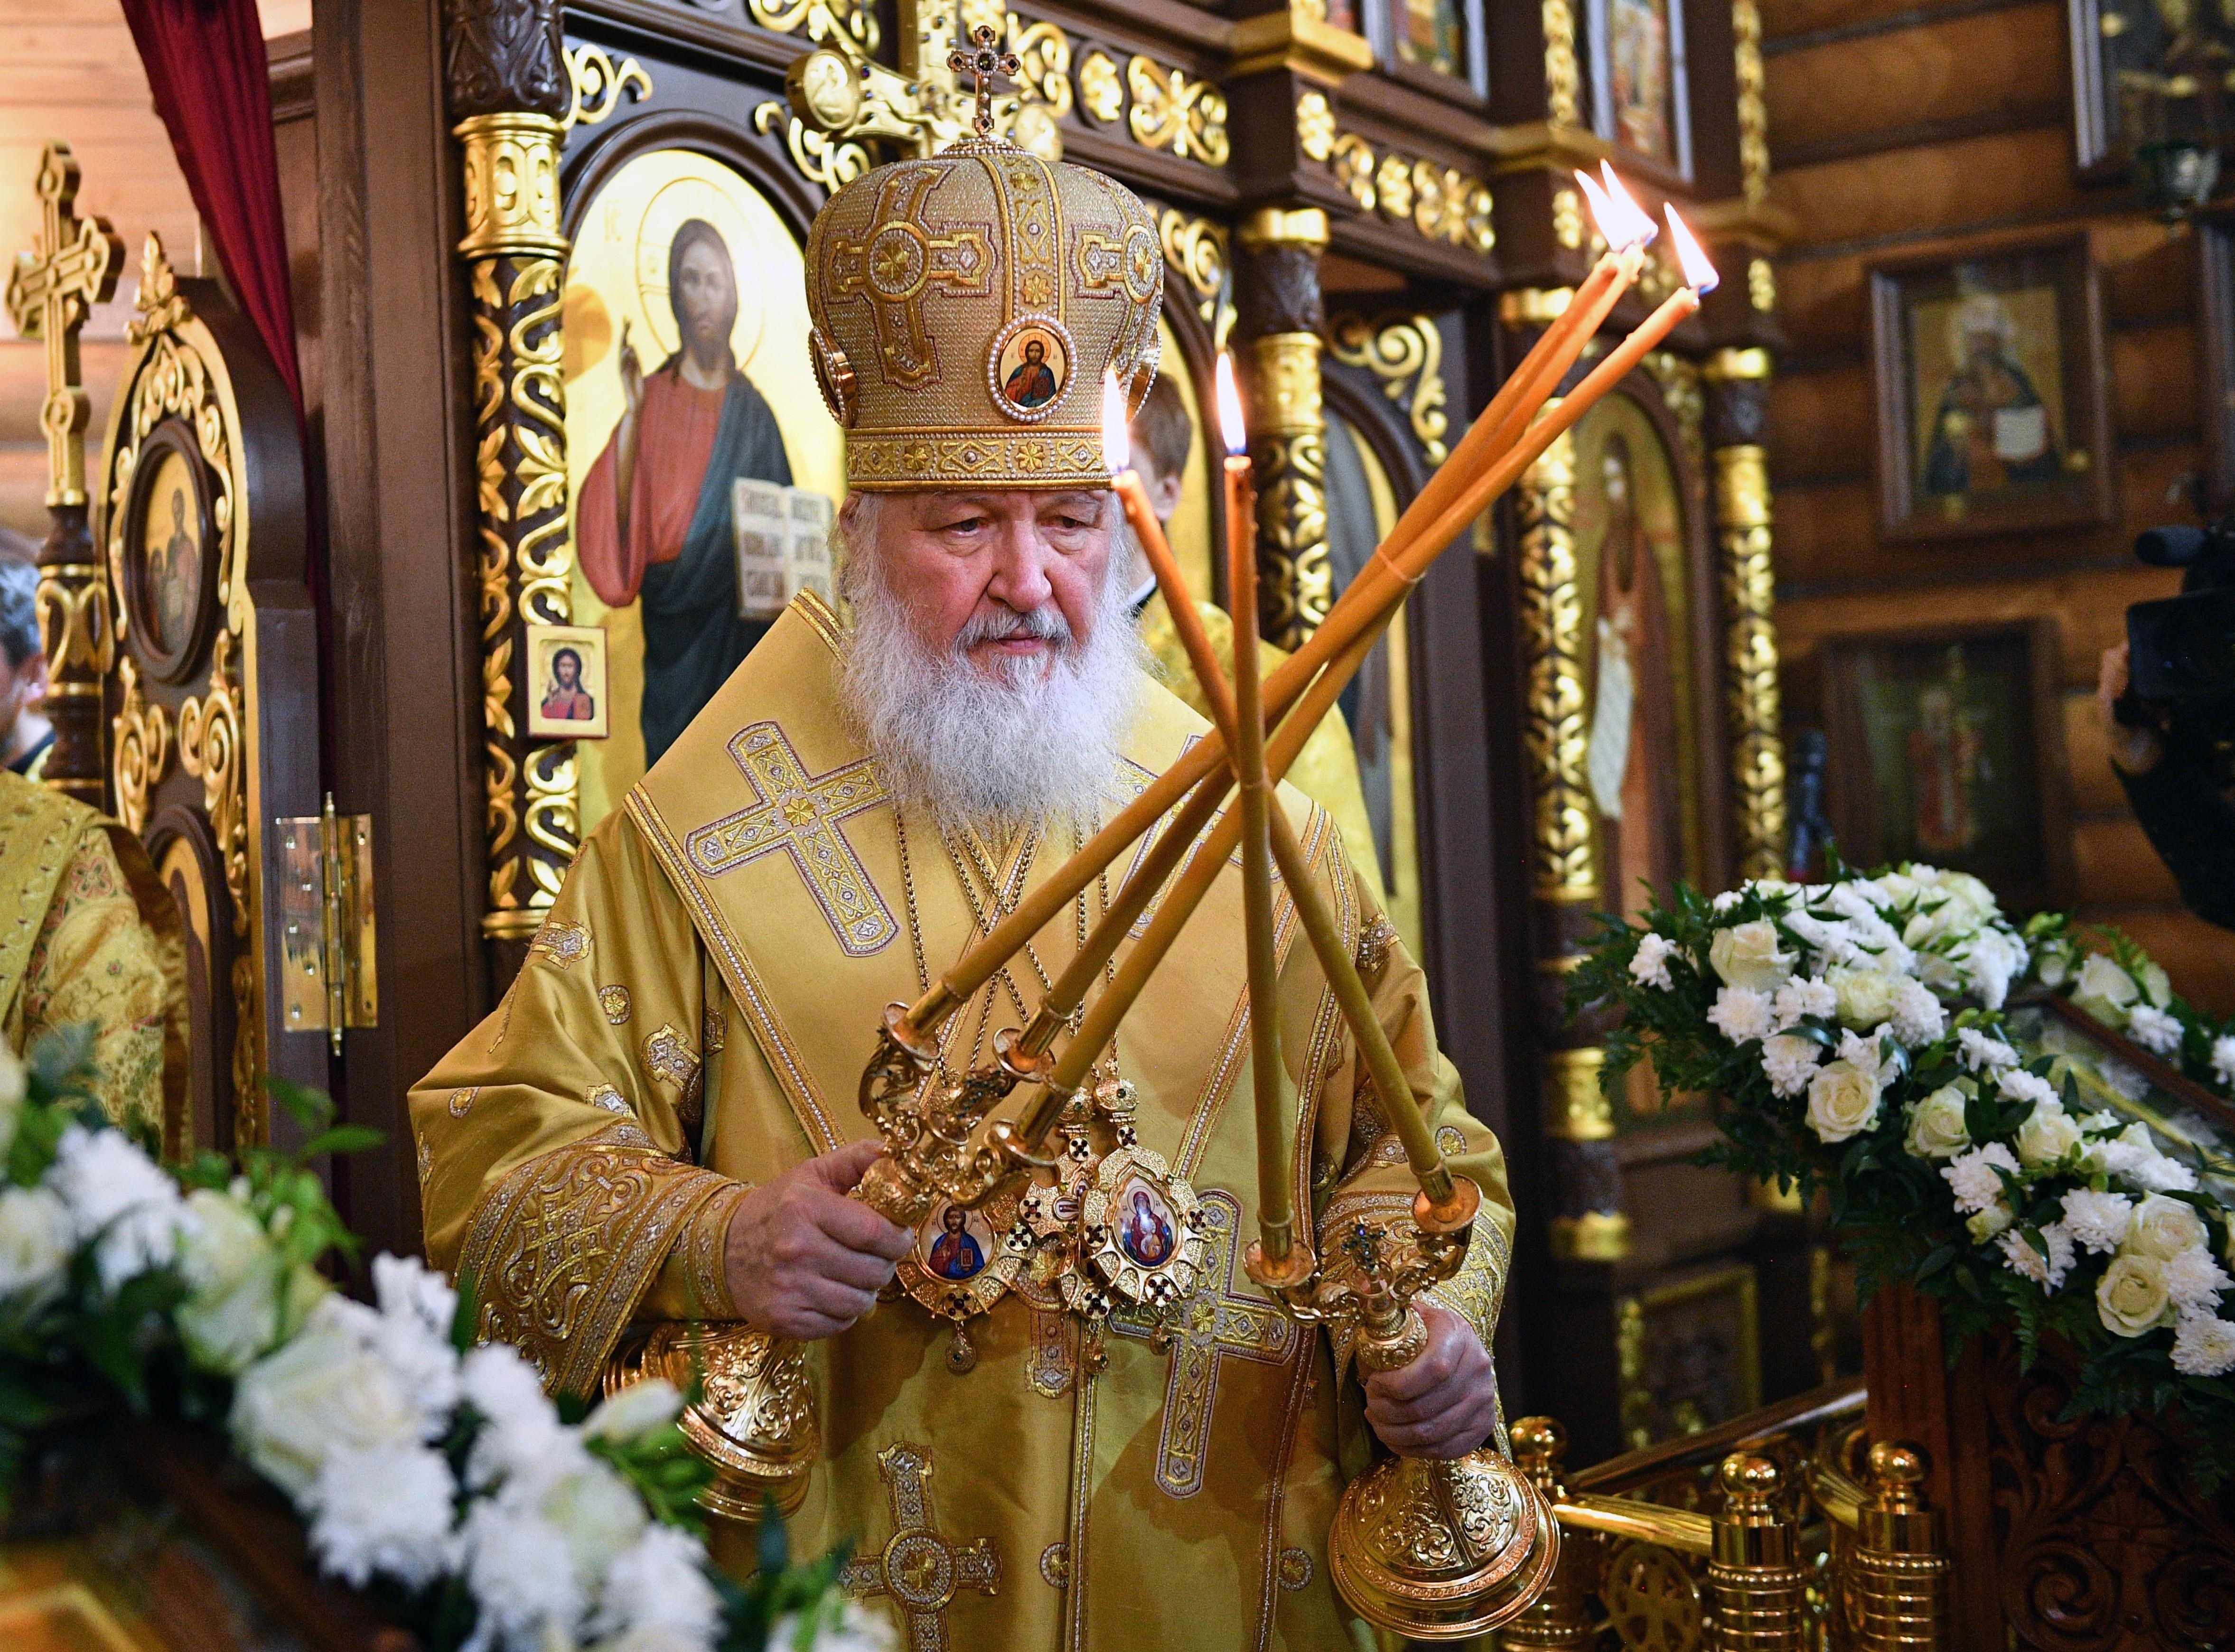 <p>Патриарх Кирилл. Фото: &copy; РИА Новости/Рамиль Ситдиков</p>